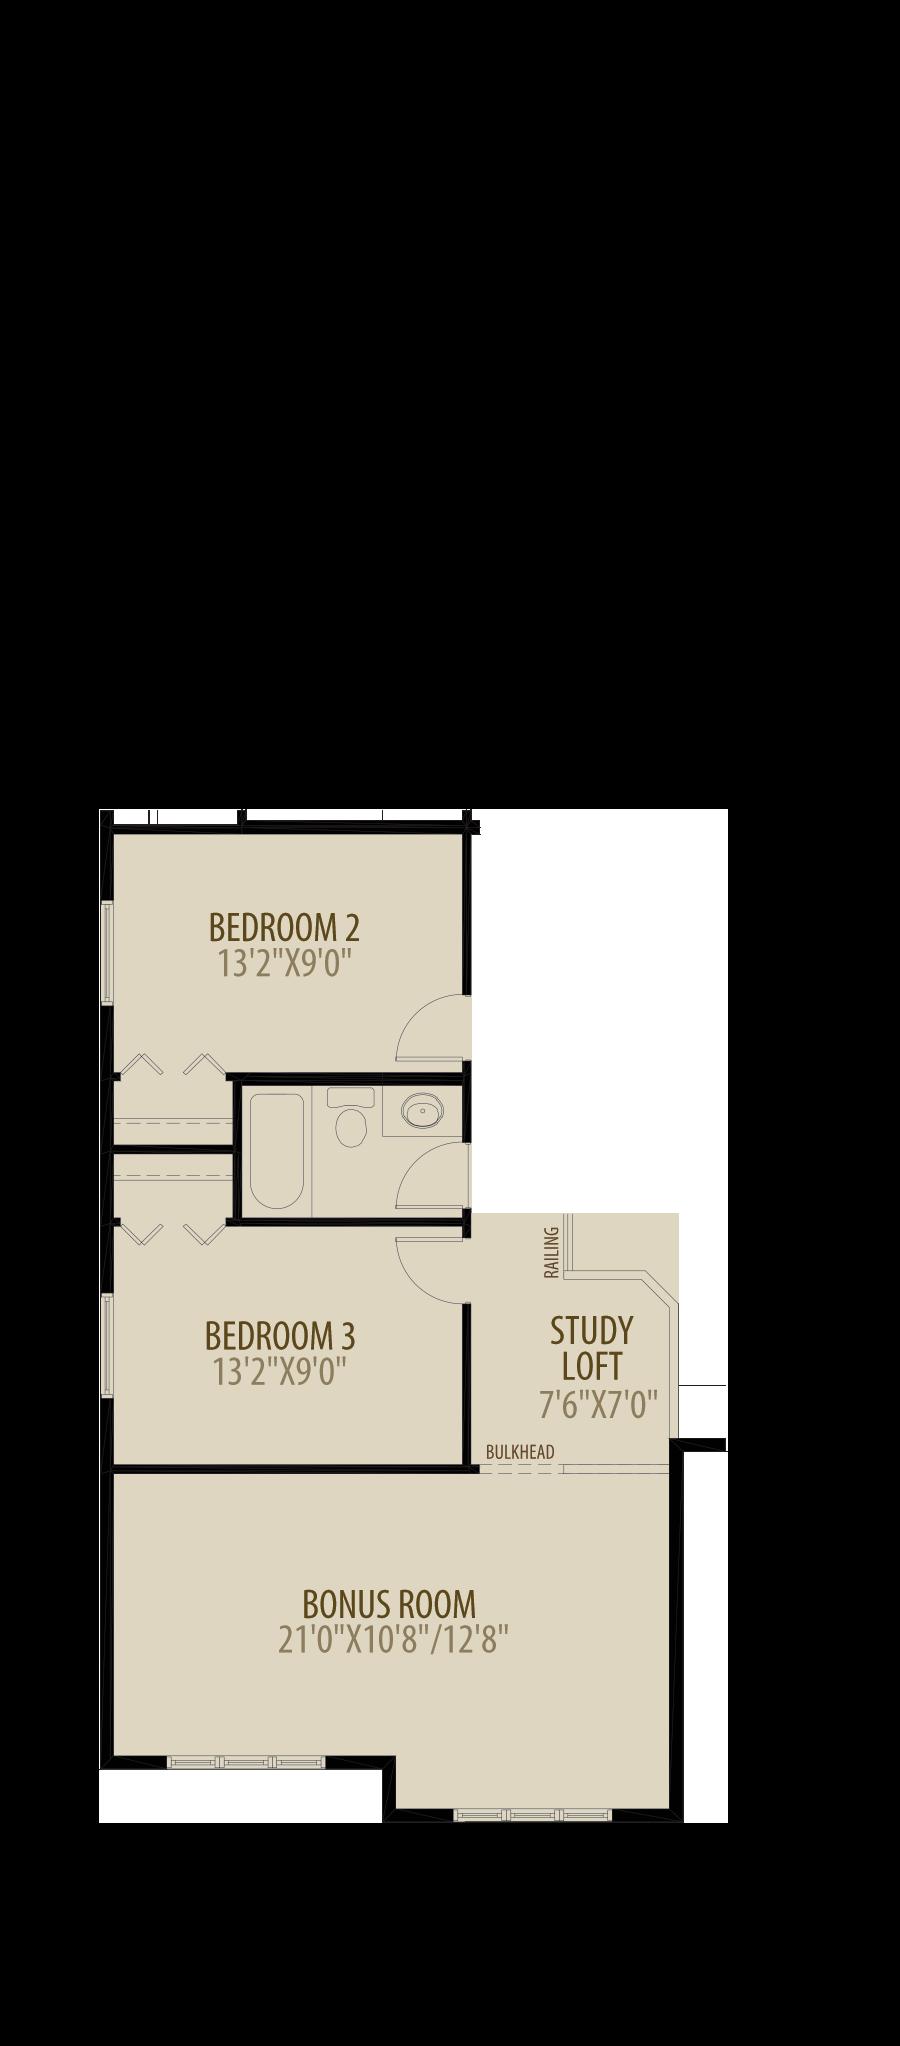 Revised Upper Floor adds 22 sq ft